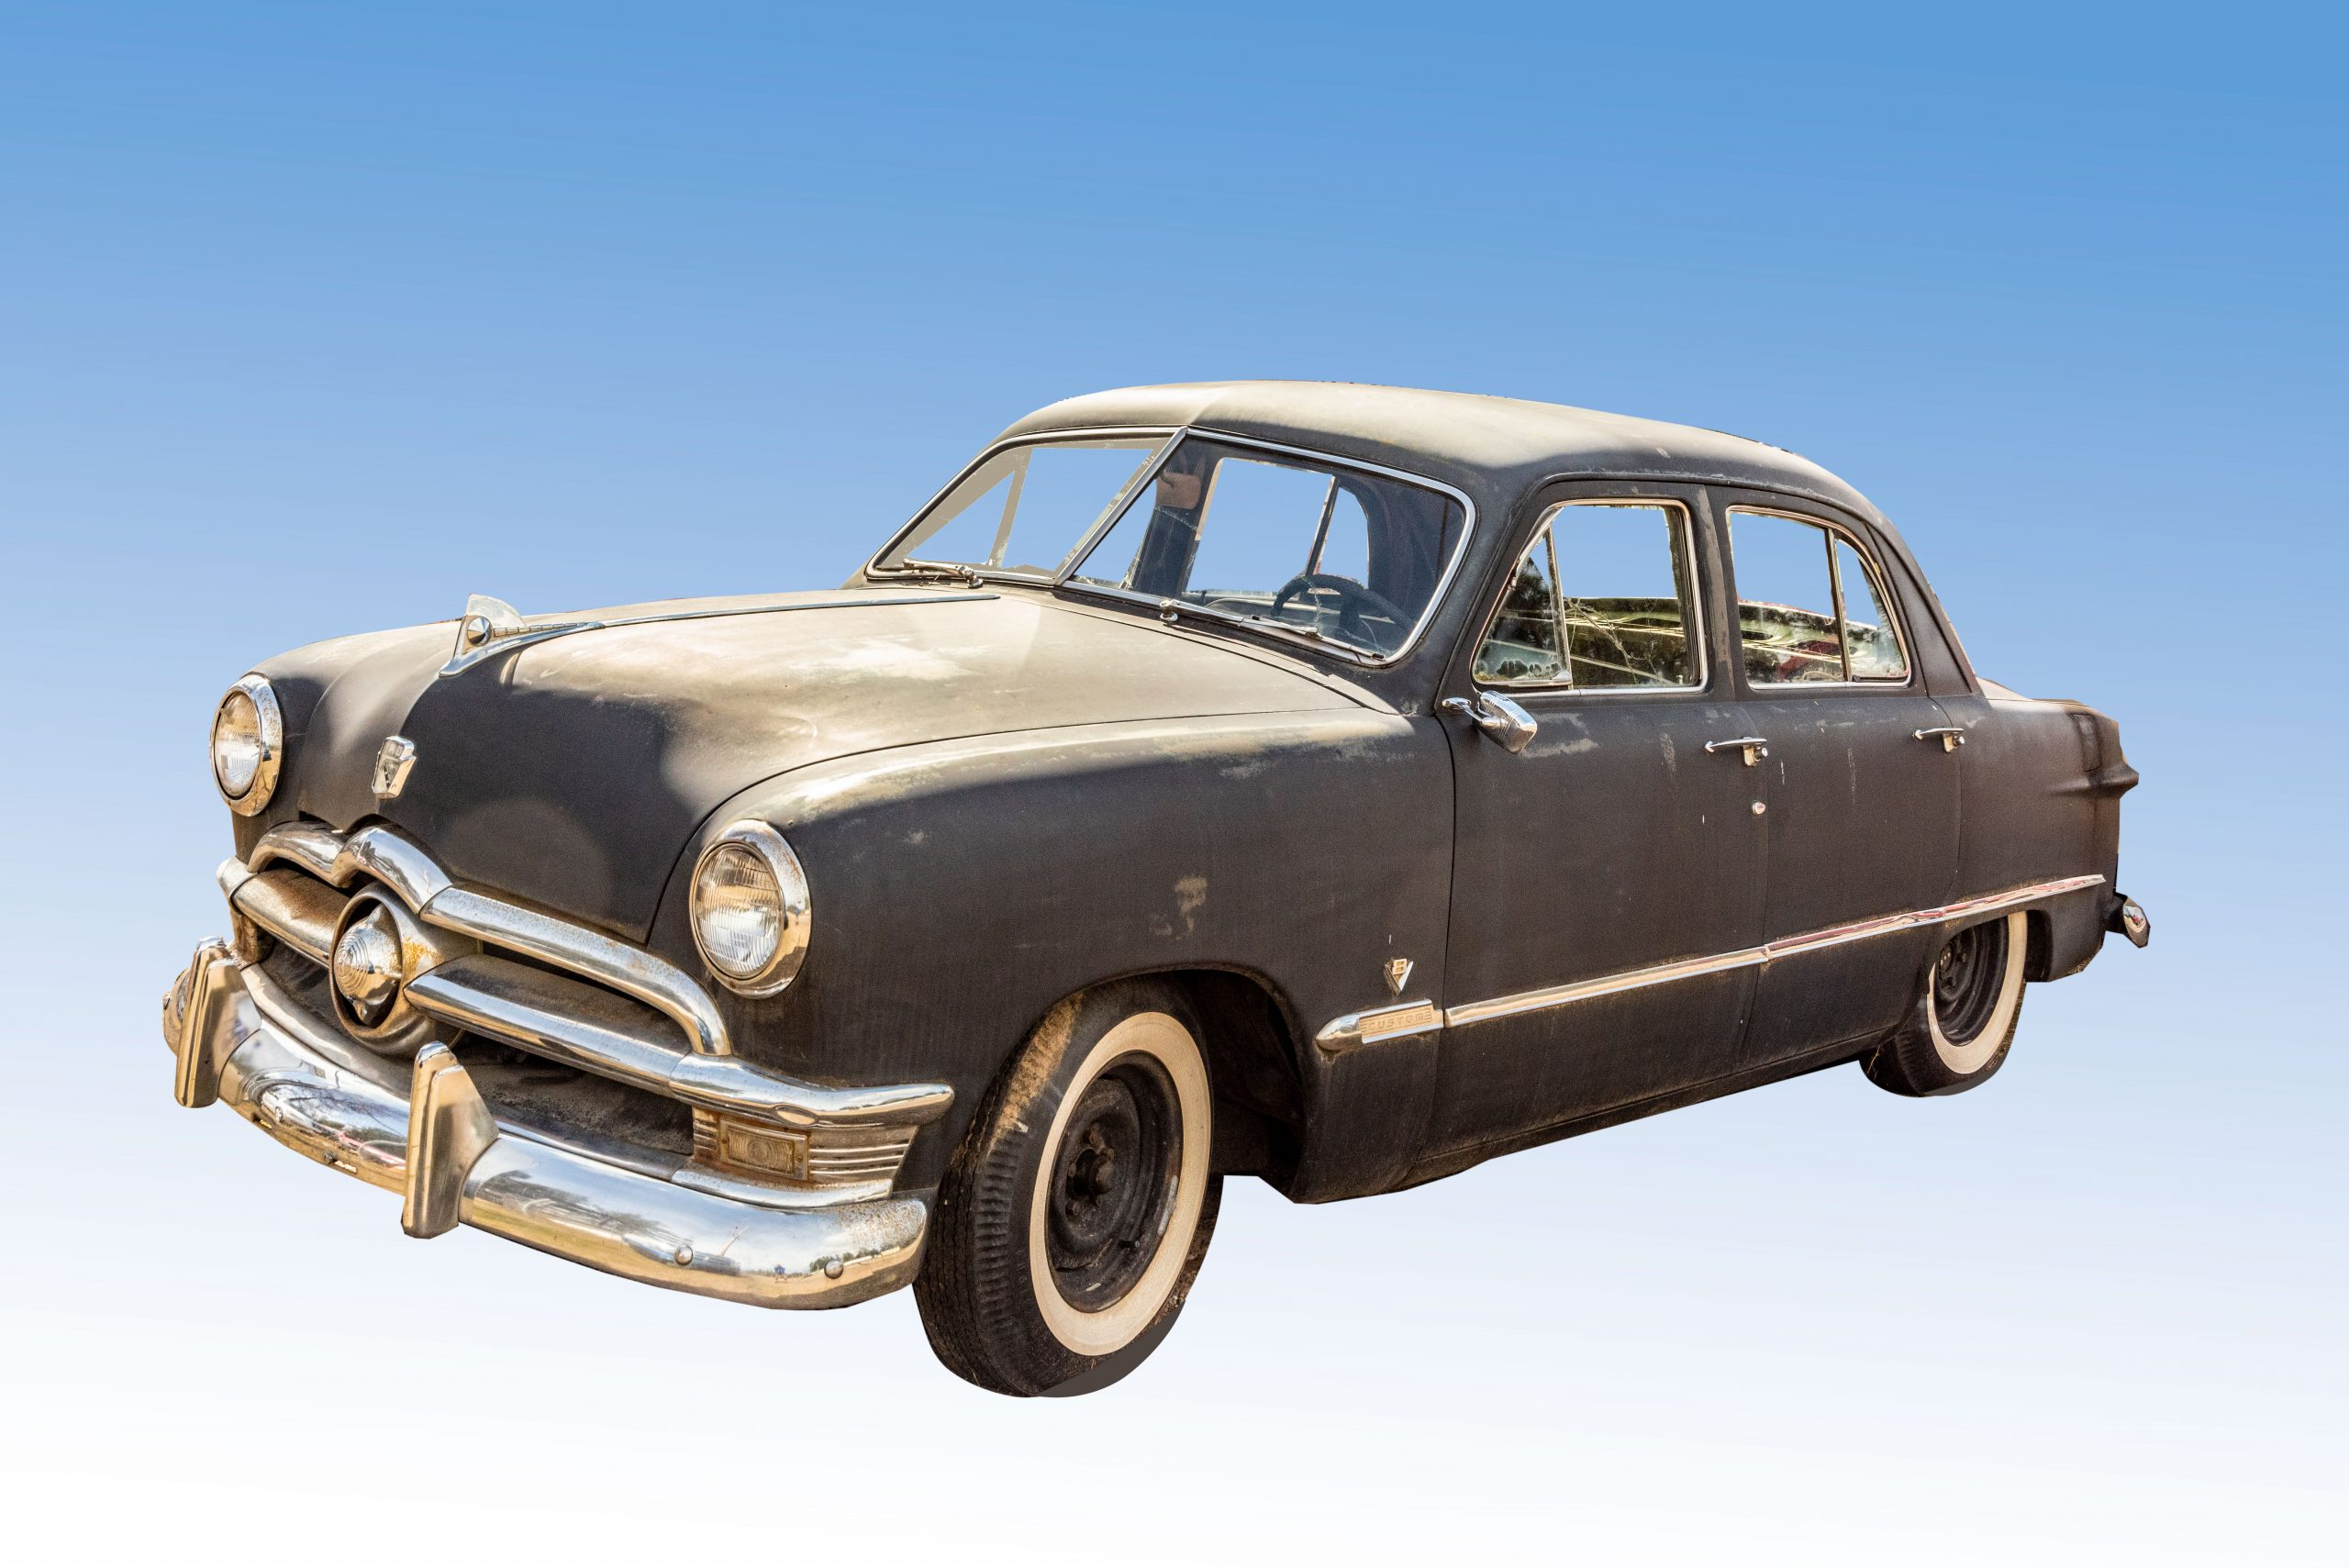 The 1950 Shoebox Ford Custom